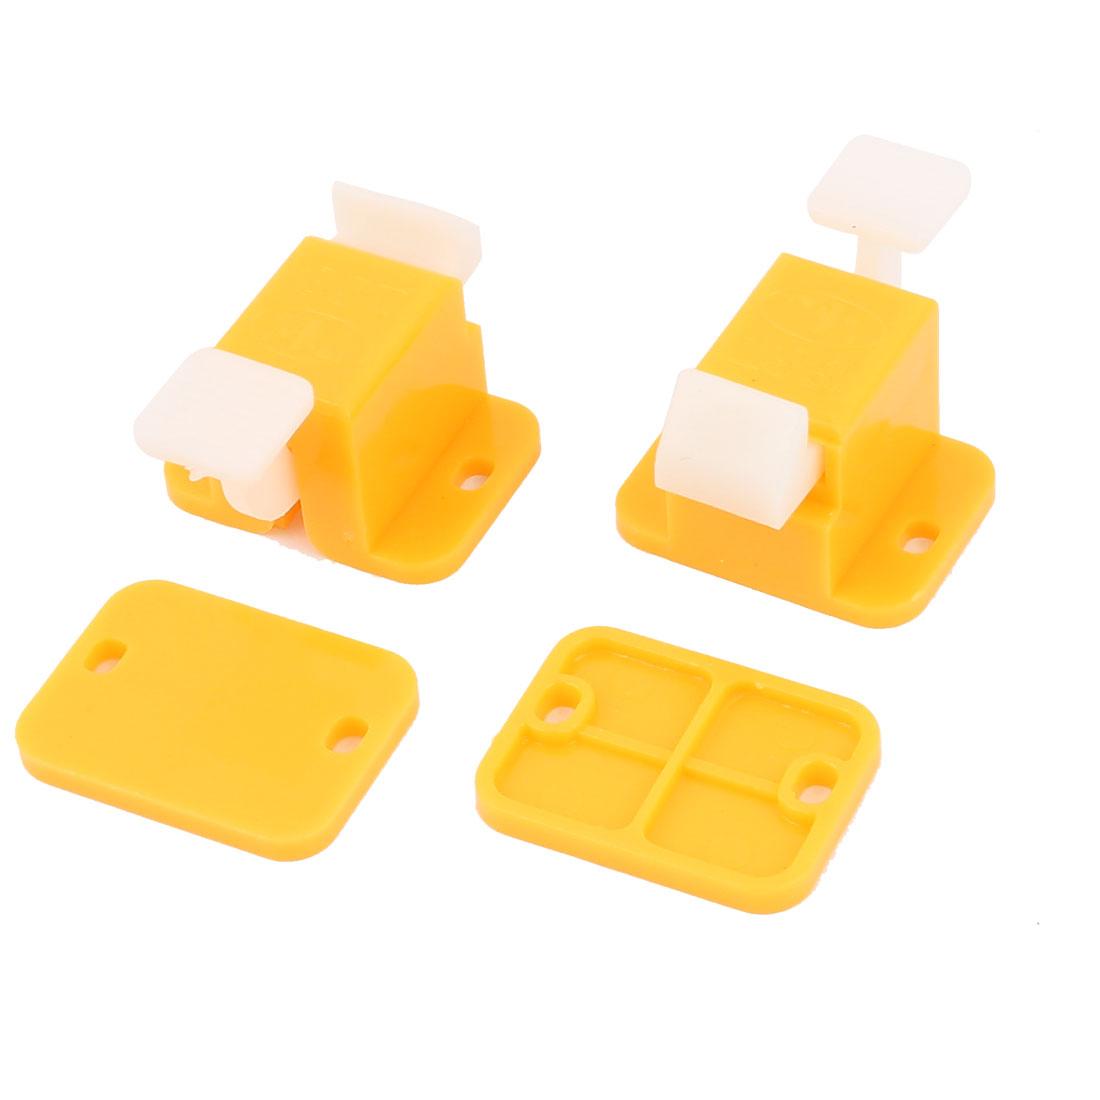 PCB ICT Prototype Test Fixture Jig Edge Latches Yellow White 2Pcs